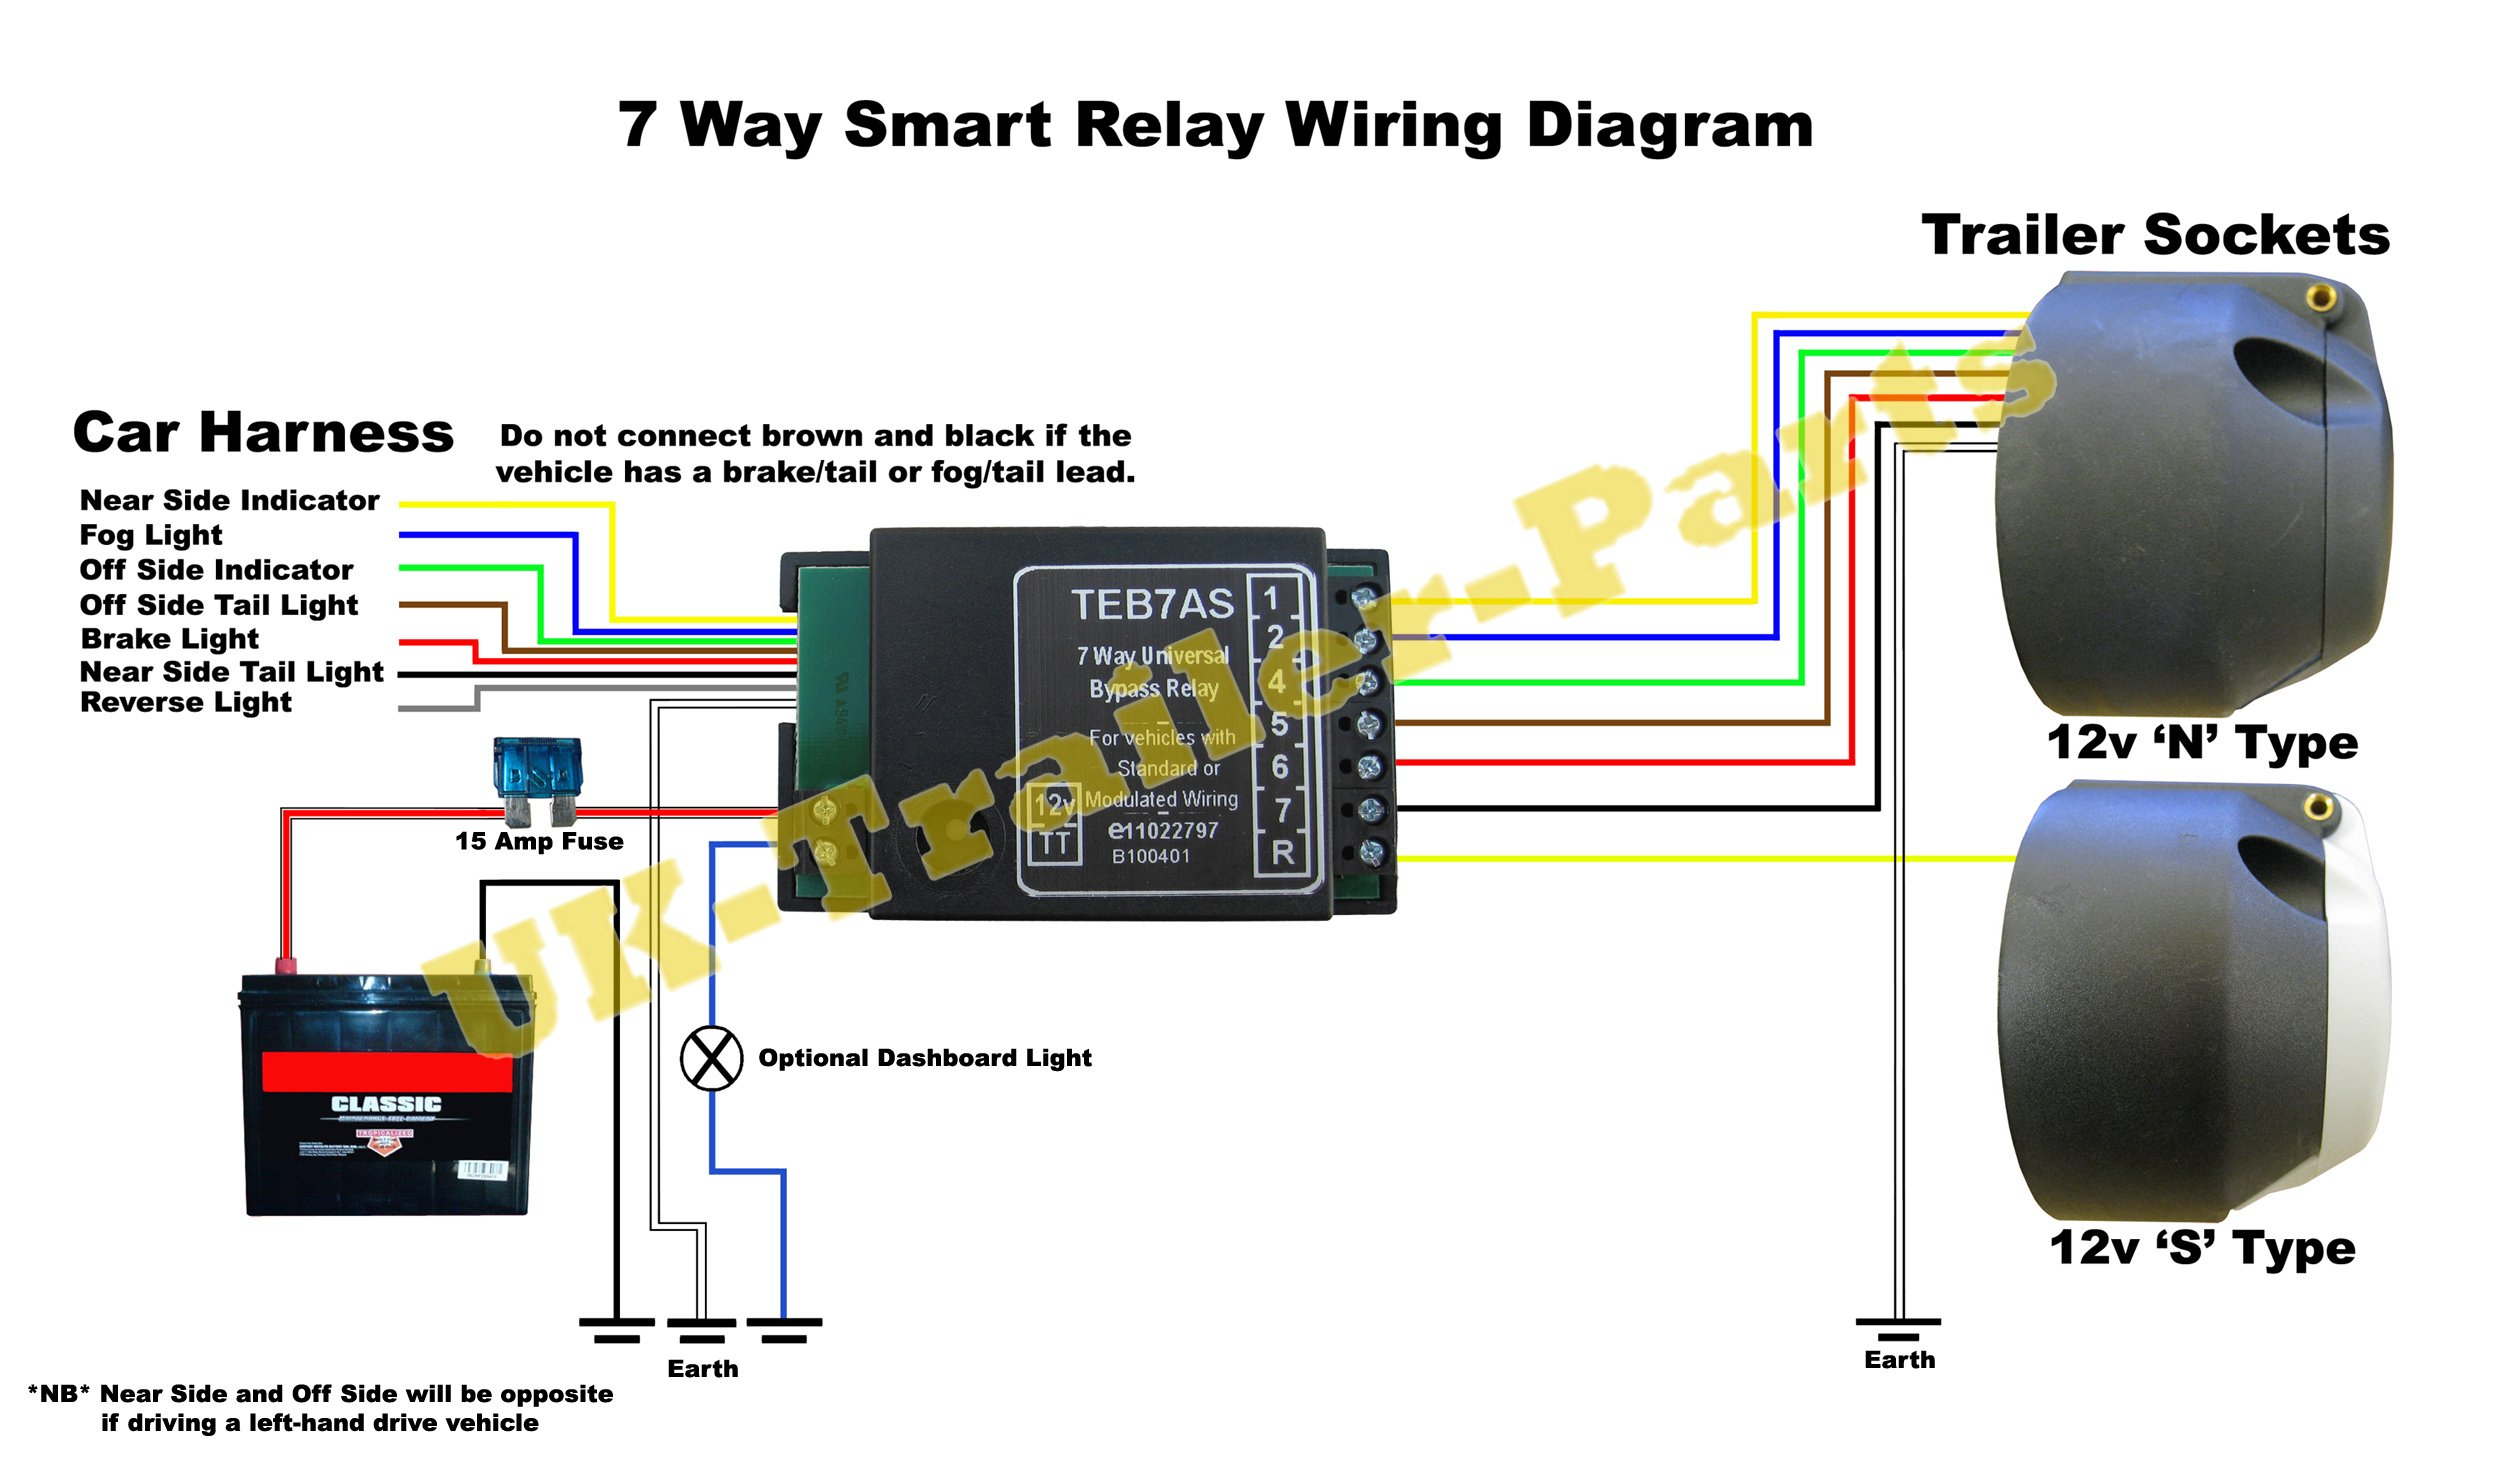 7 Way Universal Bypass Relay Wiring Diagram   Uk-Trailer-Parts - 7 Wire Trailer Wiring Diagram